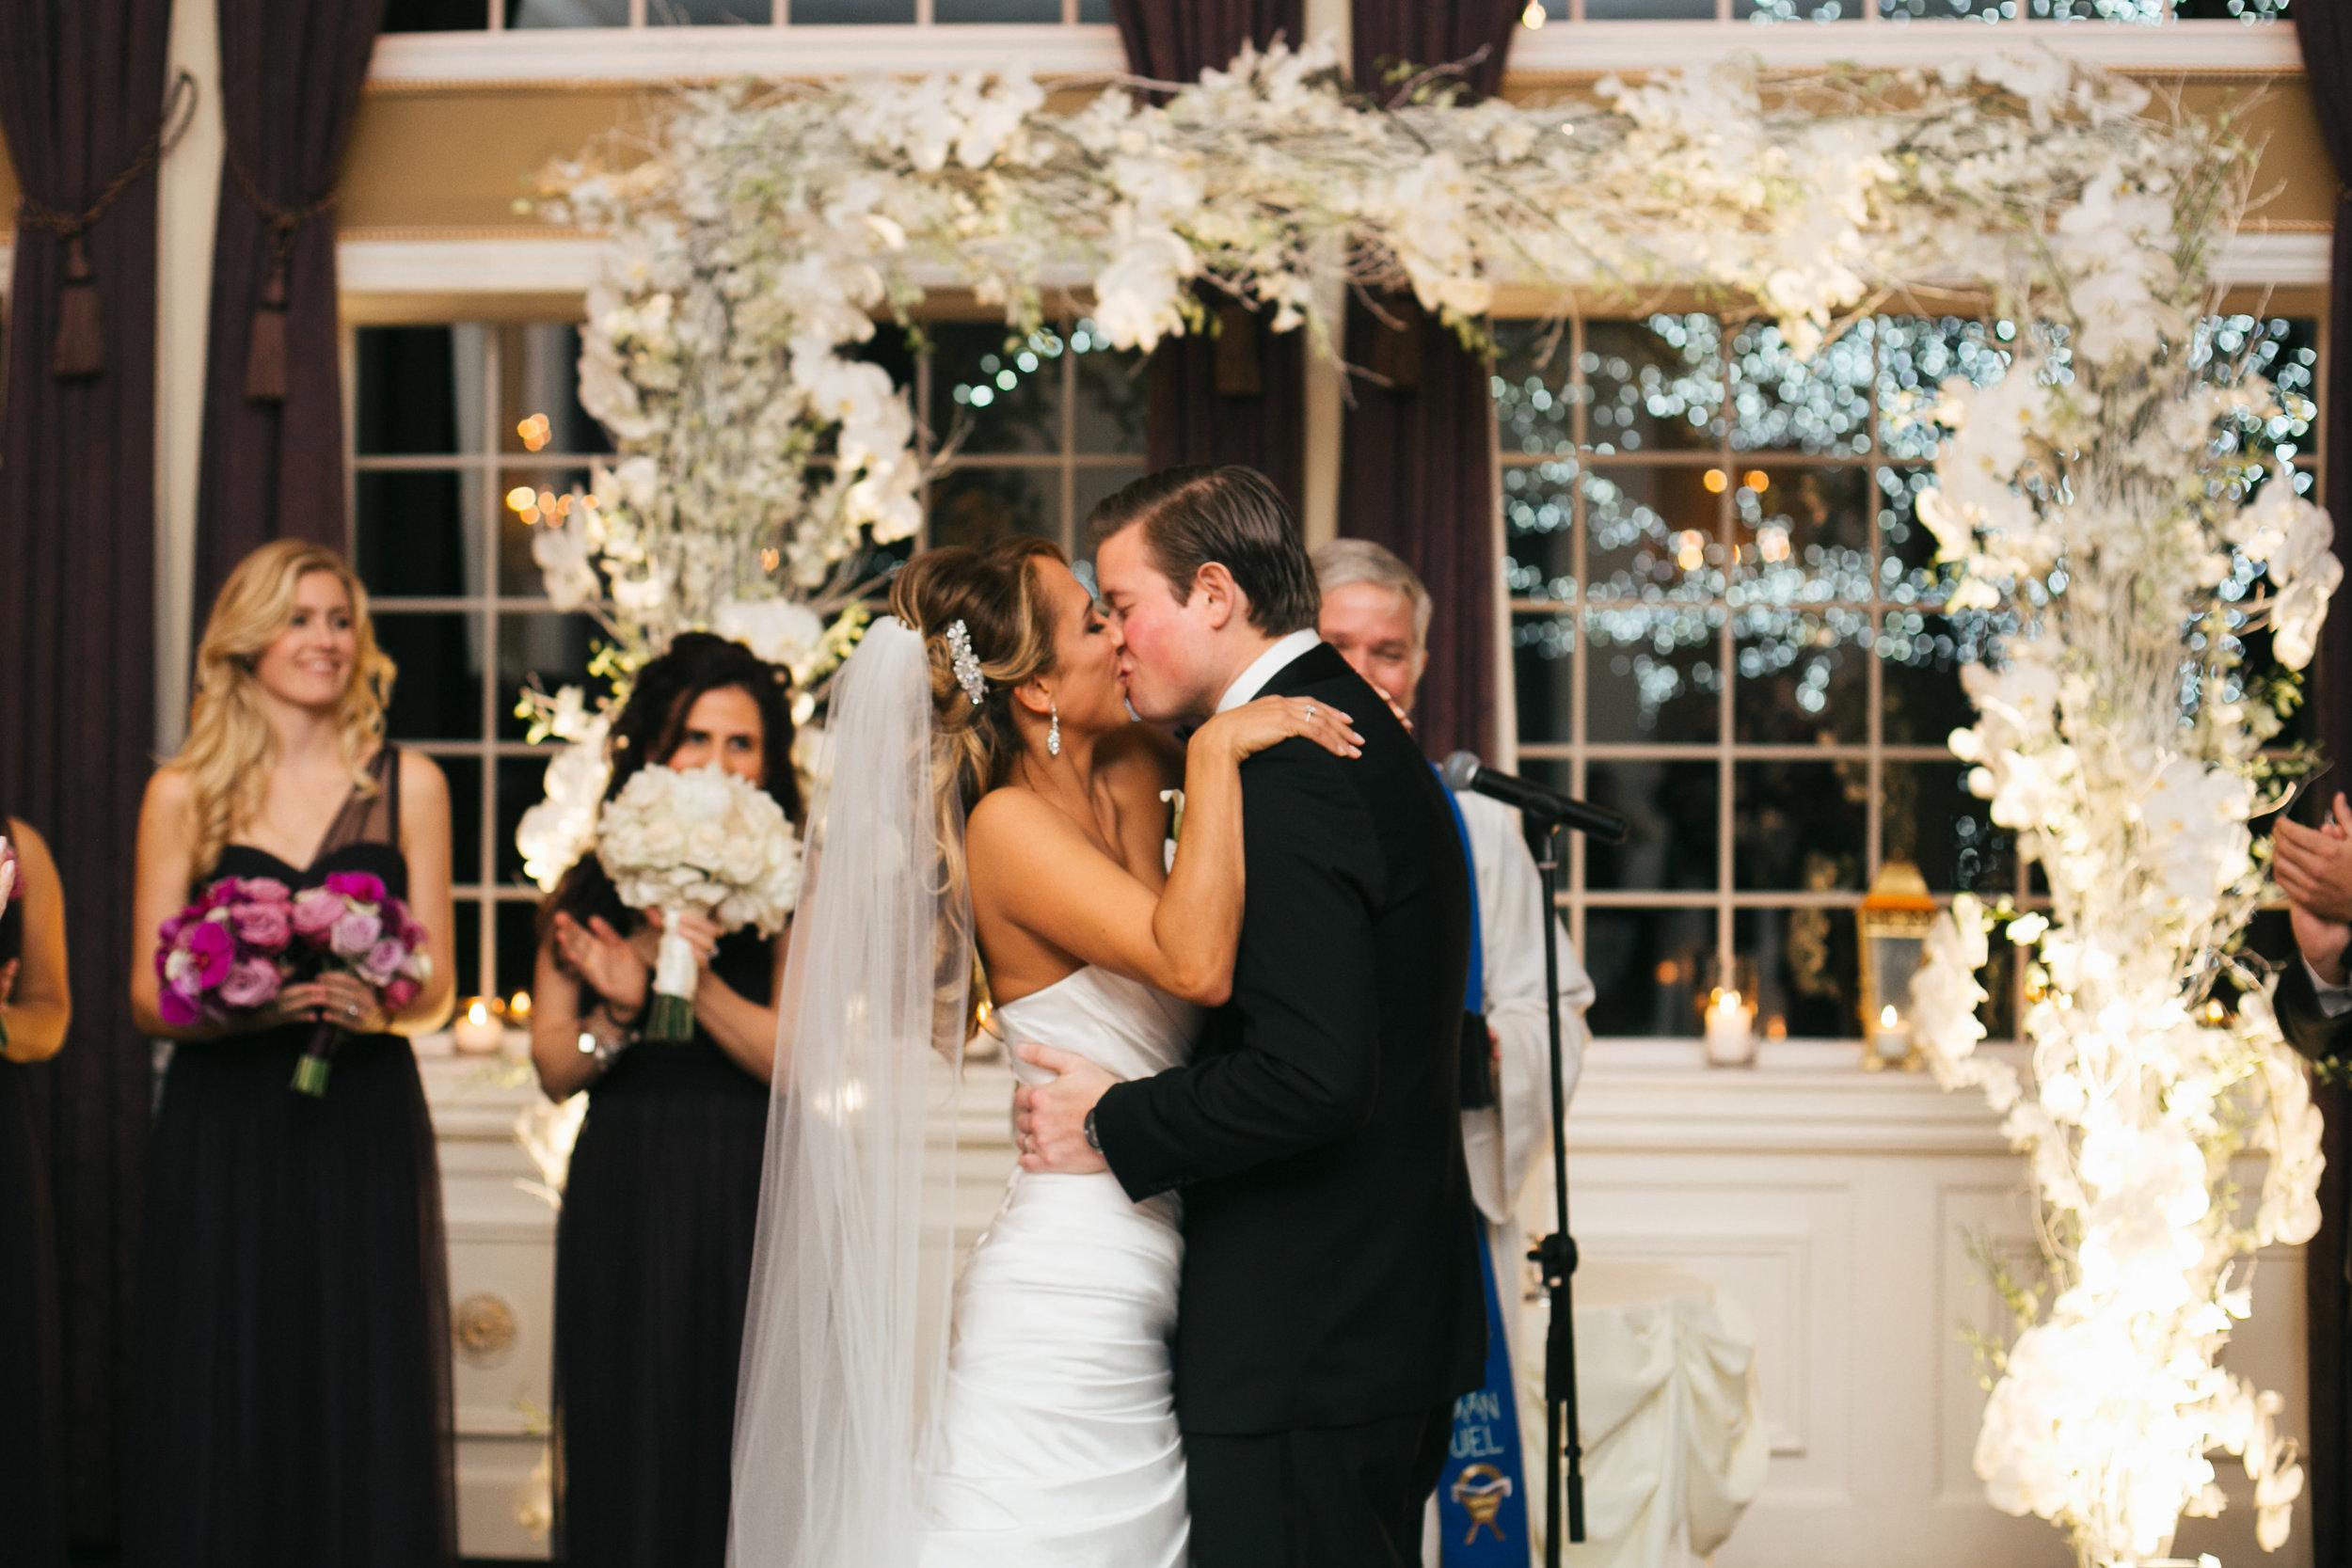 Ceci_New_York_Custom_Invitation_ New_Jersey_Wedding_Luxury_Personalized_Ceci_Style_Bride_Foil_Stamping48.jpg